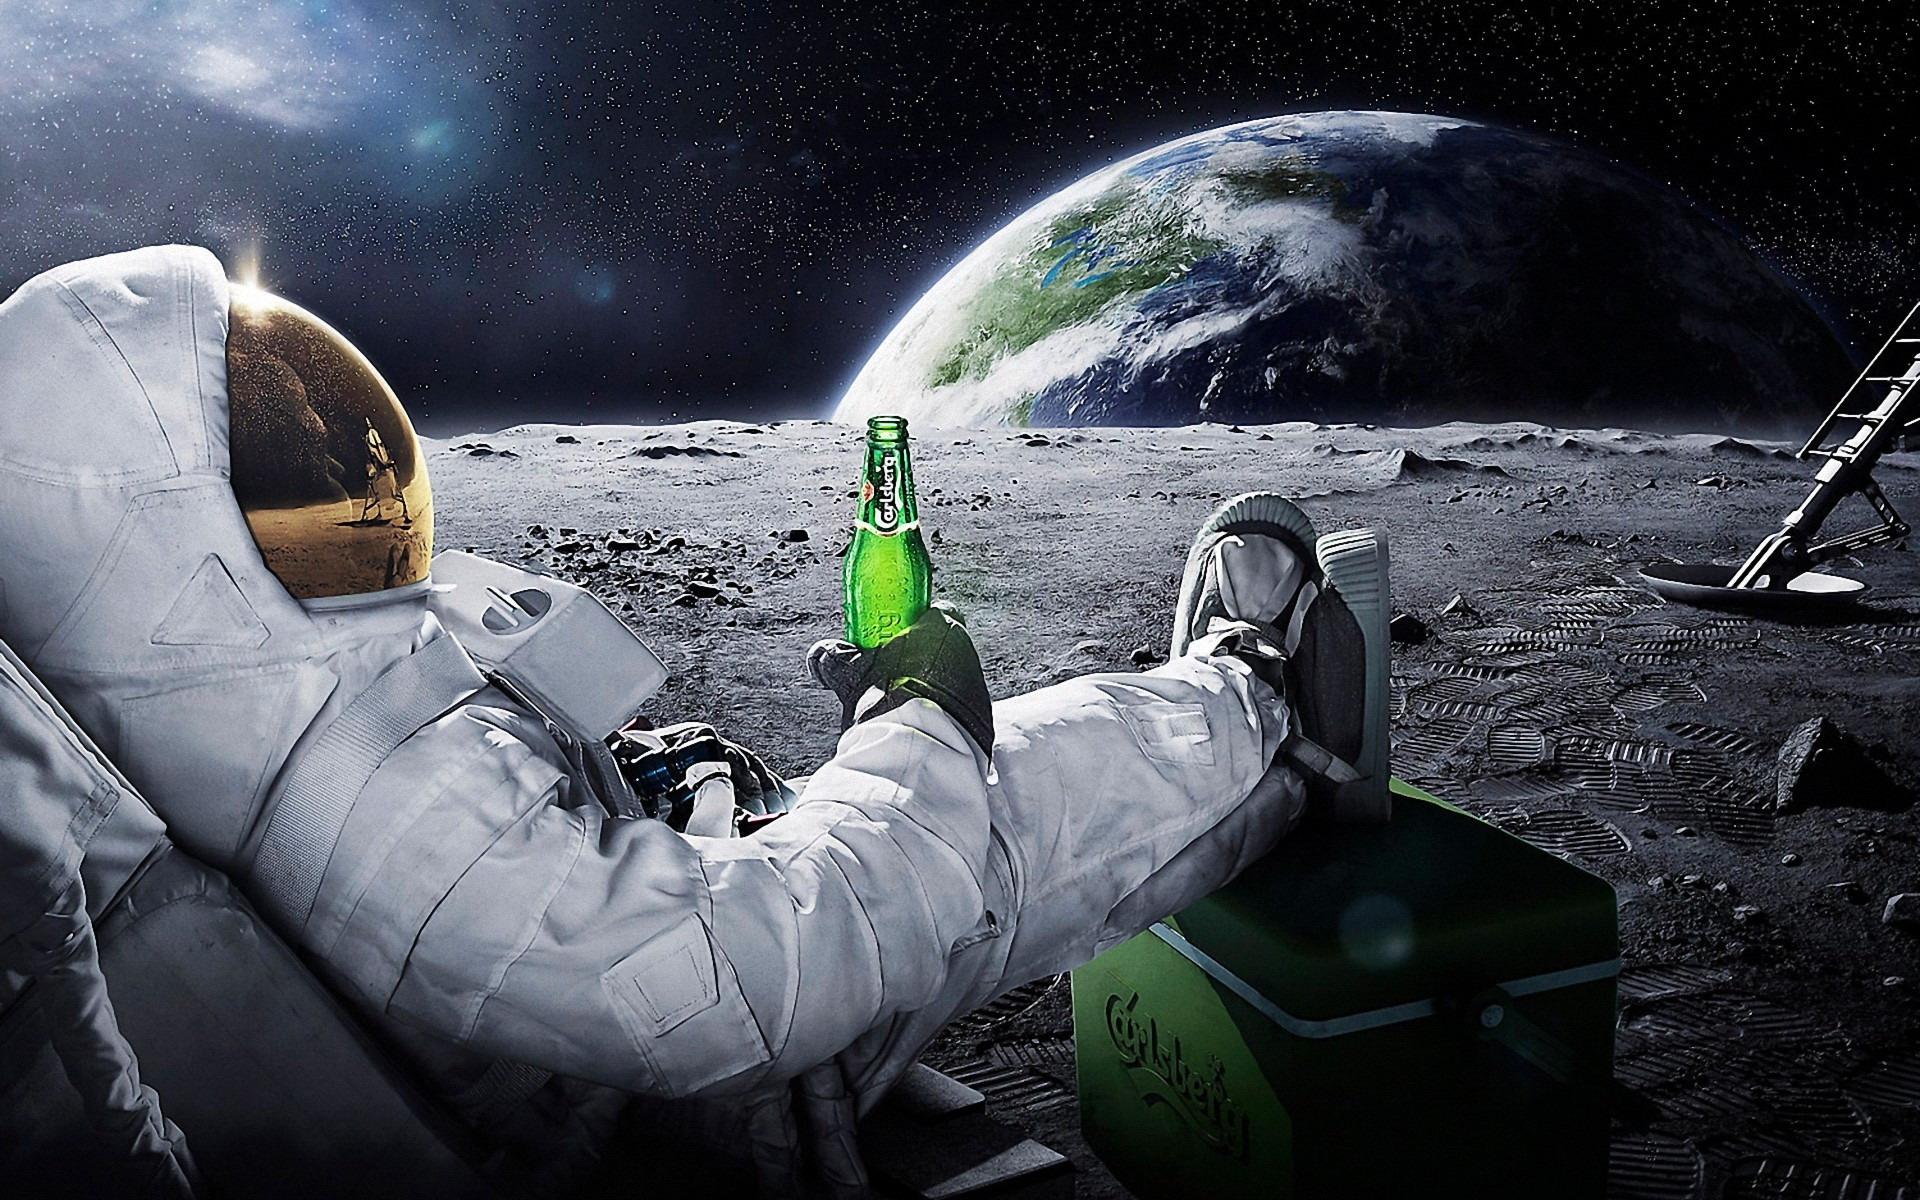 реклама пива carlsberg spaceman